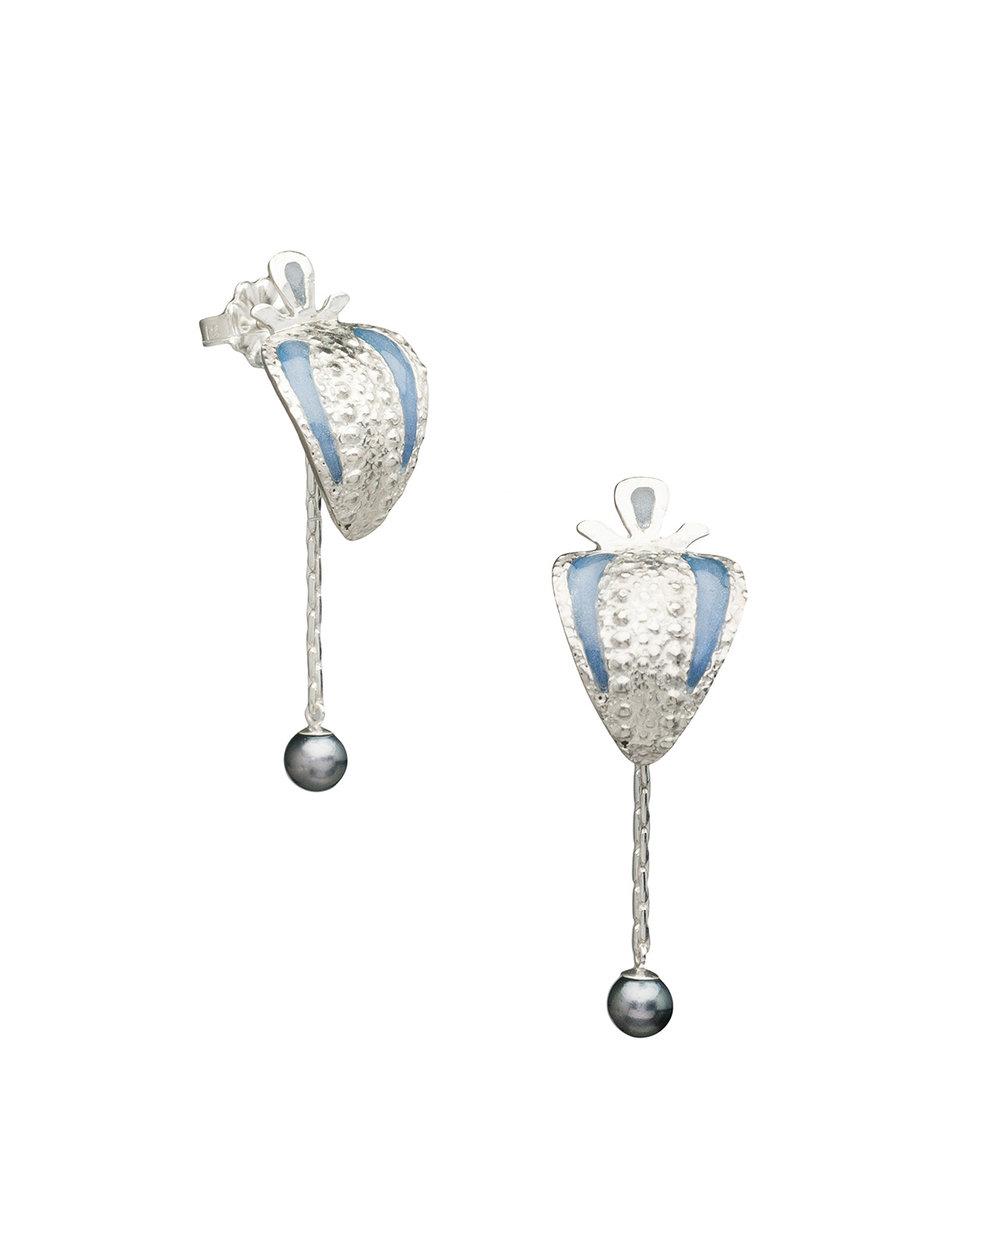 2015-10-Mary-Lynn-Podiluk-Argot-Earrings-P101a.jpg